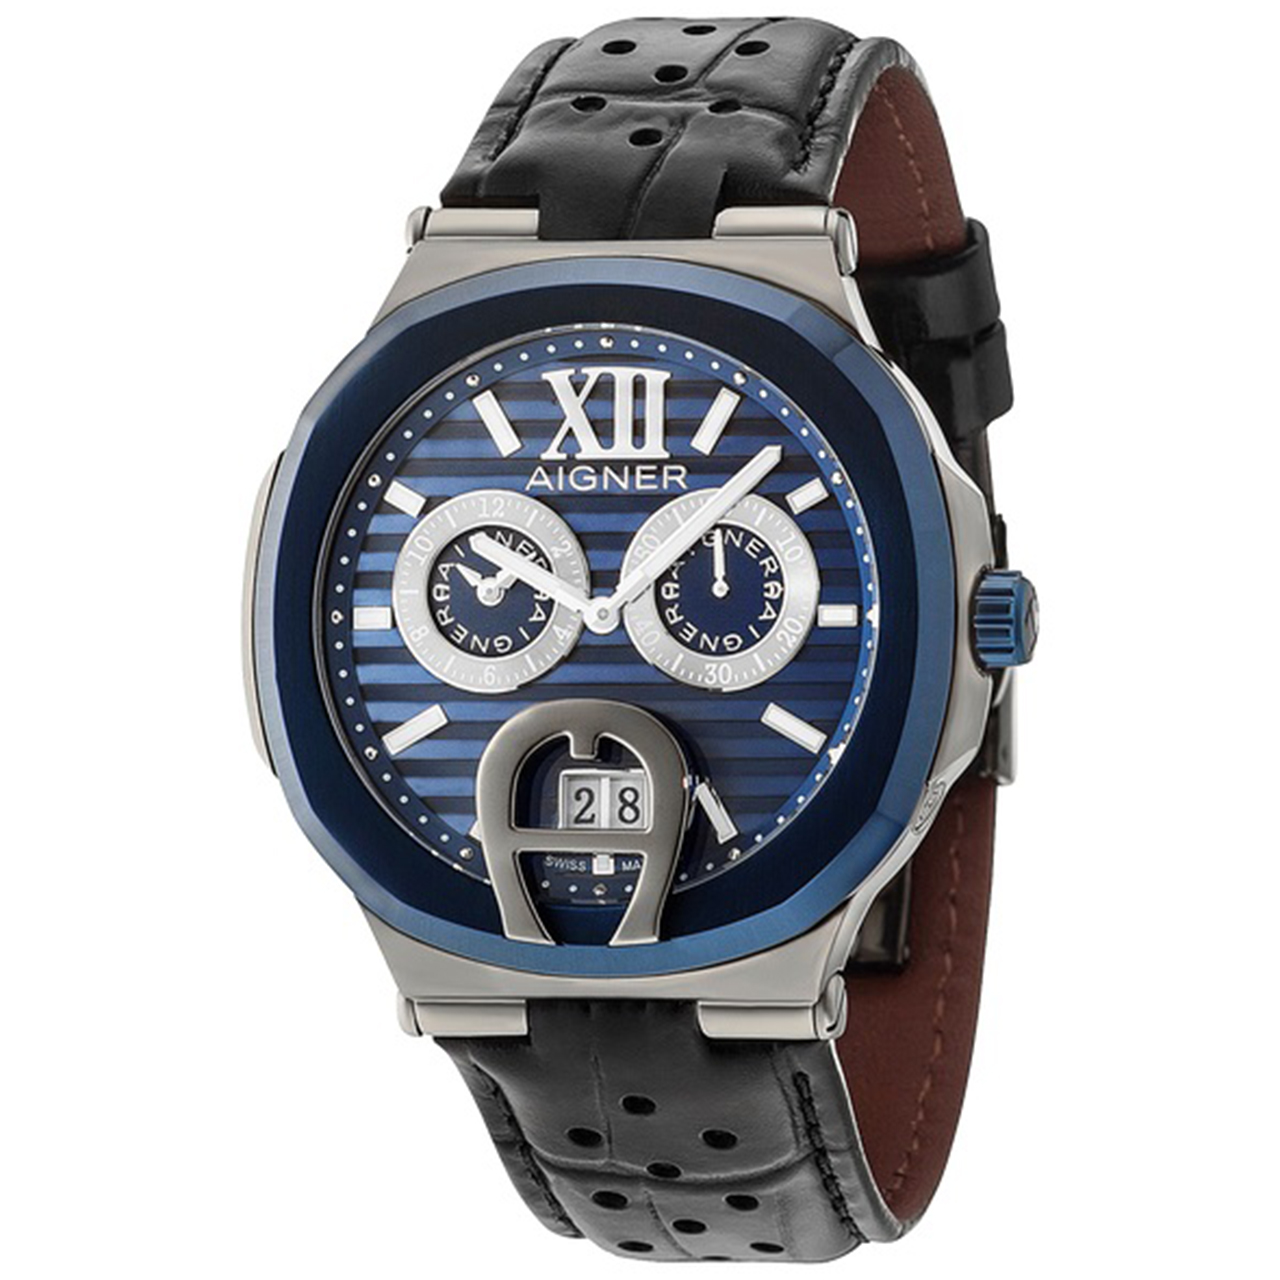 ساعت مچی عقربه ای مردانه اگنر مدل A113105 35